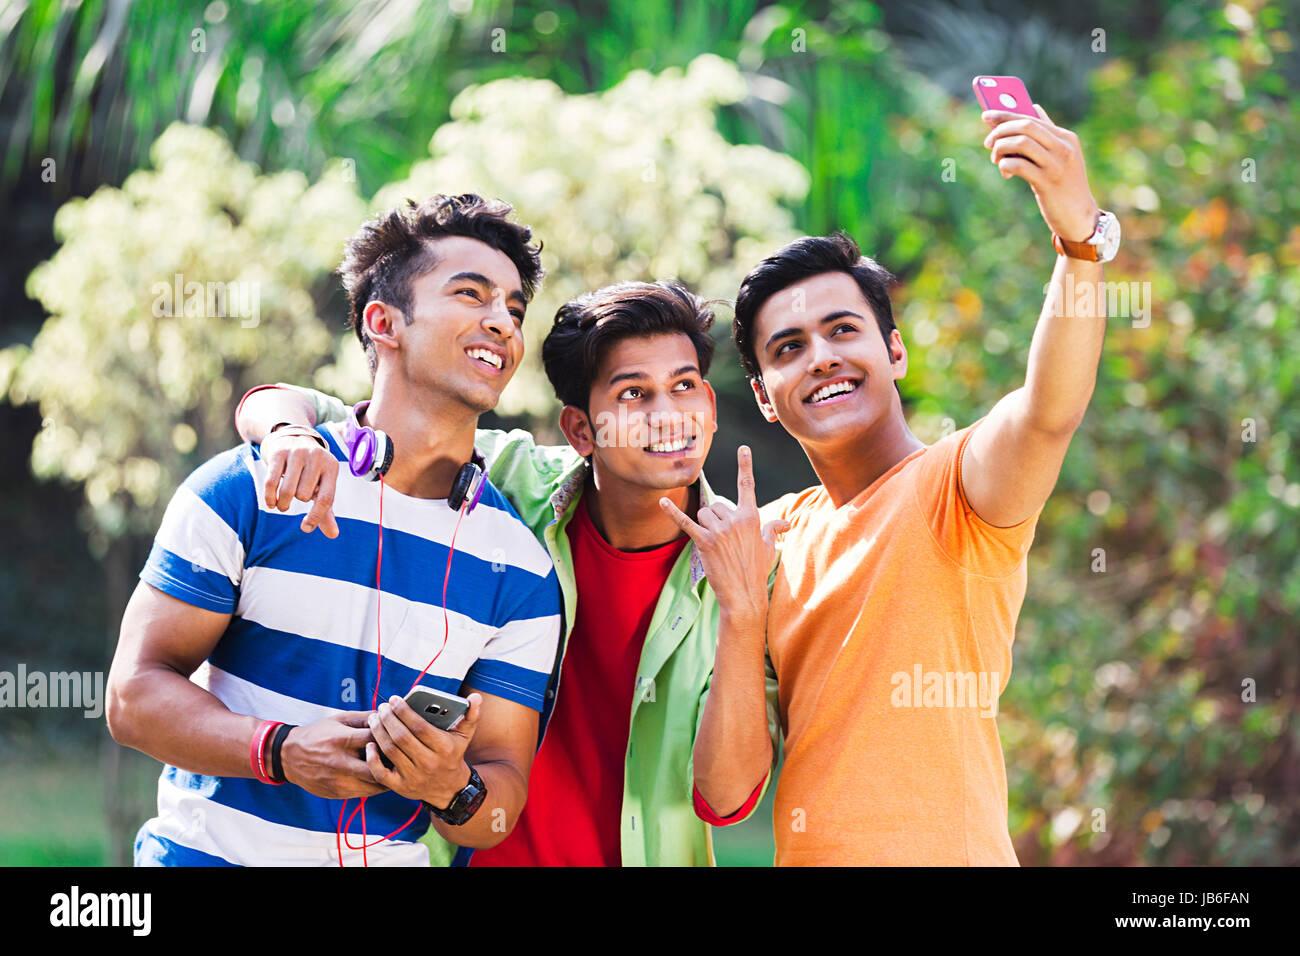 3 Indian College Boys Friends Taking Selfie Phone In Park